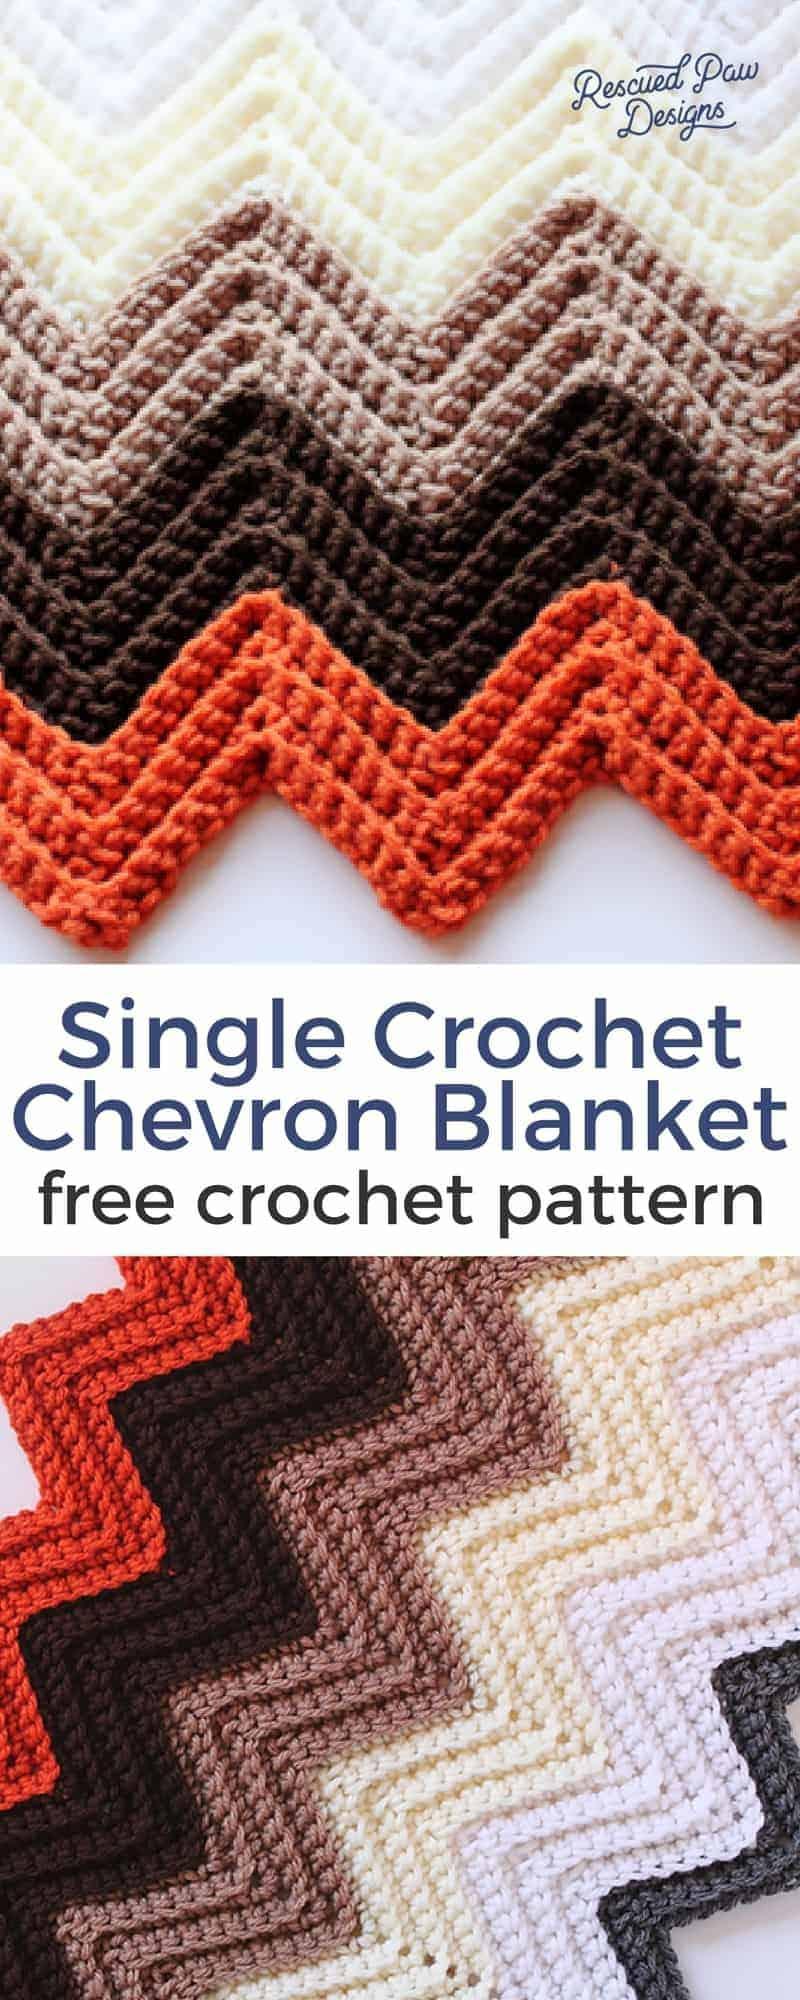 Chevron Crochet Blanket Pattern - Easy Crochet